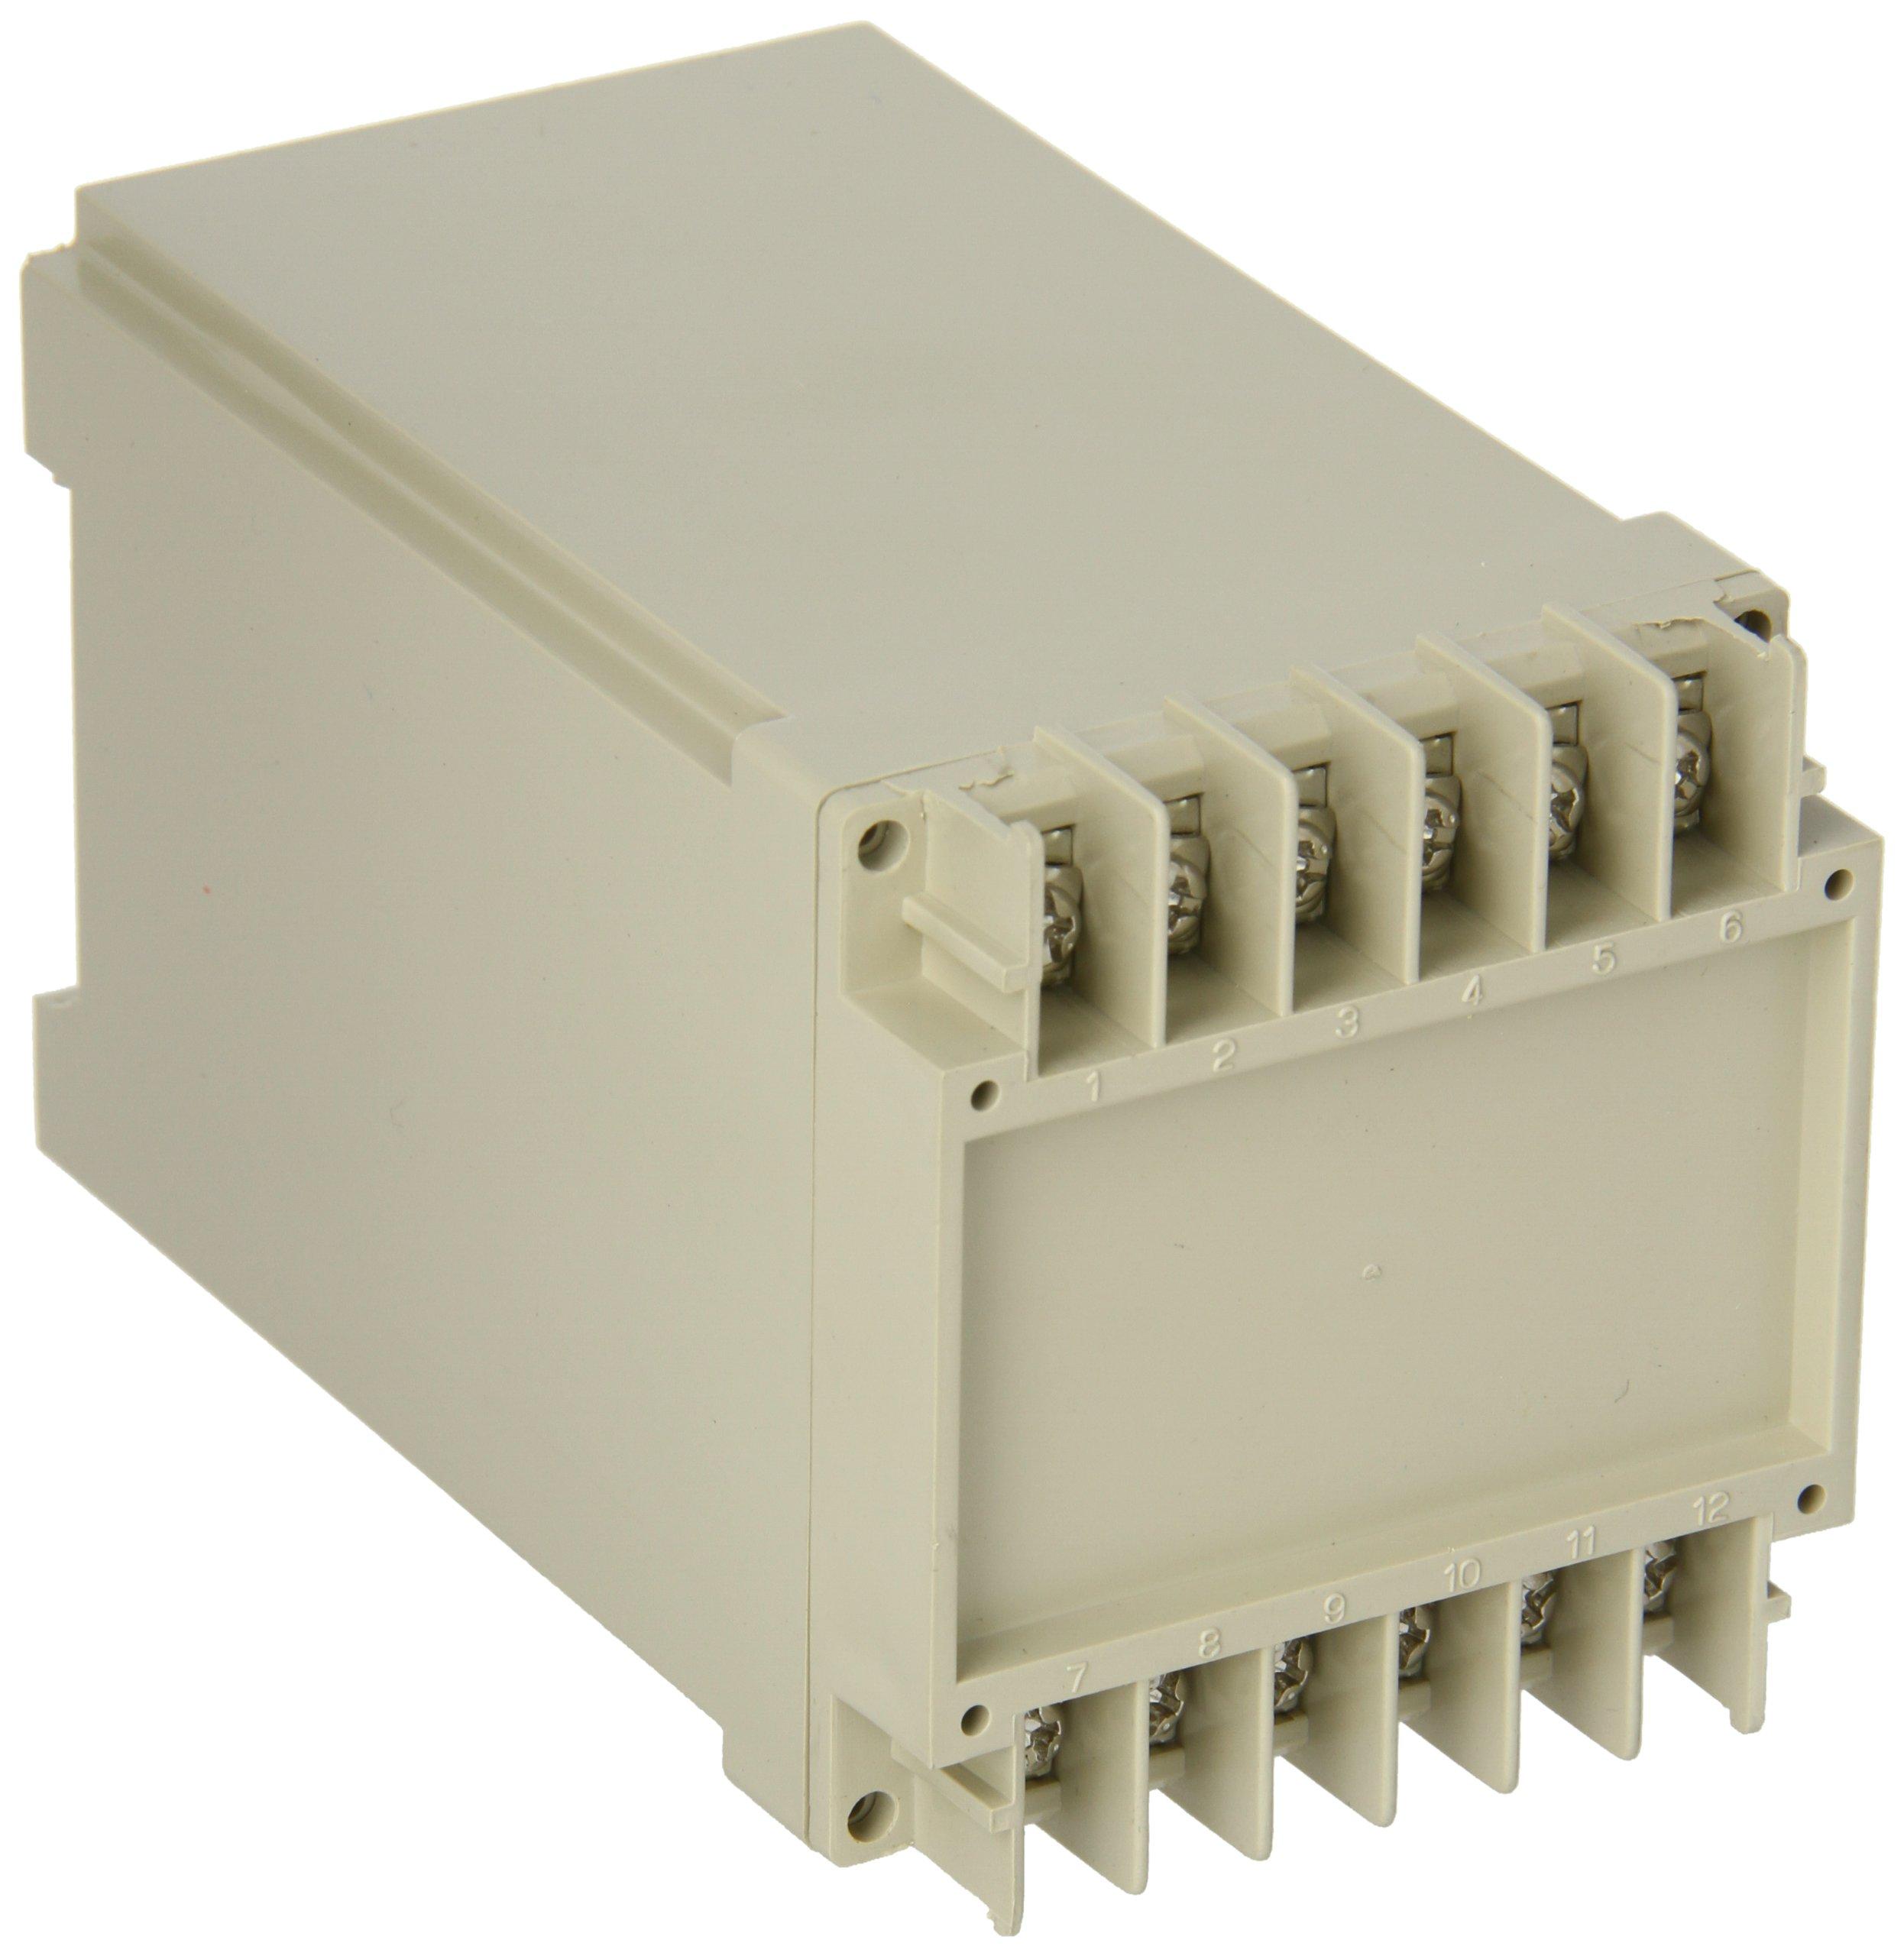 BUD Industries DB-4701 Plastic DIN Rail Mount Box, 2-9/16'' Width x 2-3/4'' Height x 4-13/32'' Depth, Light Gray Finish by BUD Industries (Image #1)